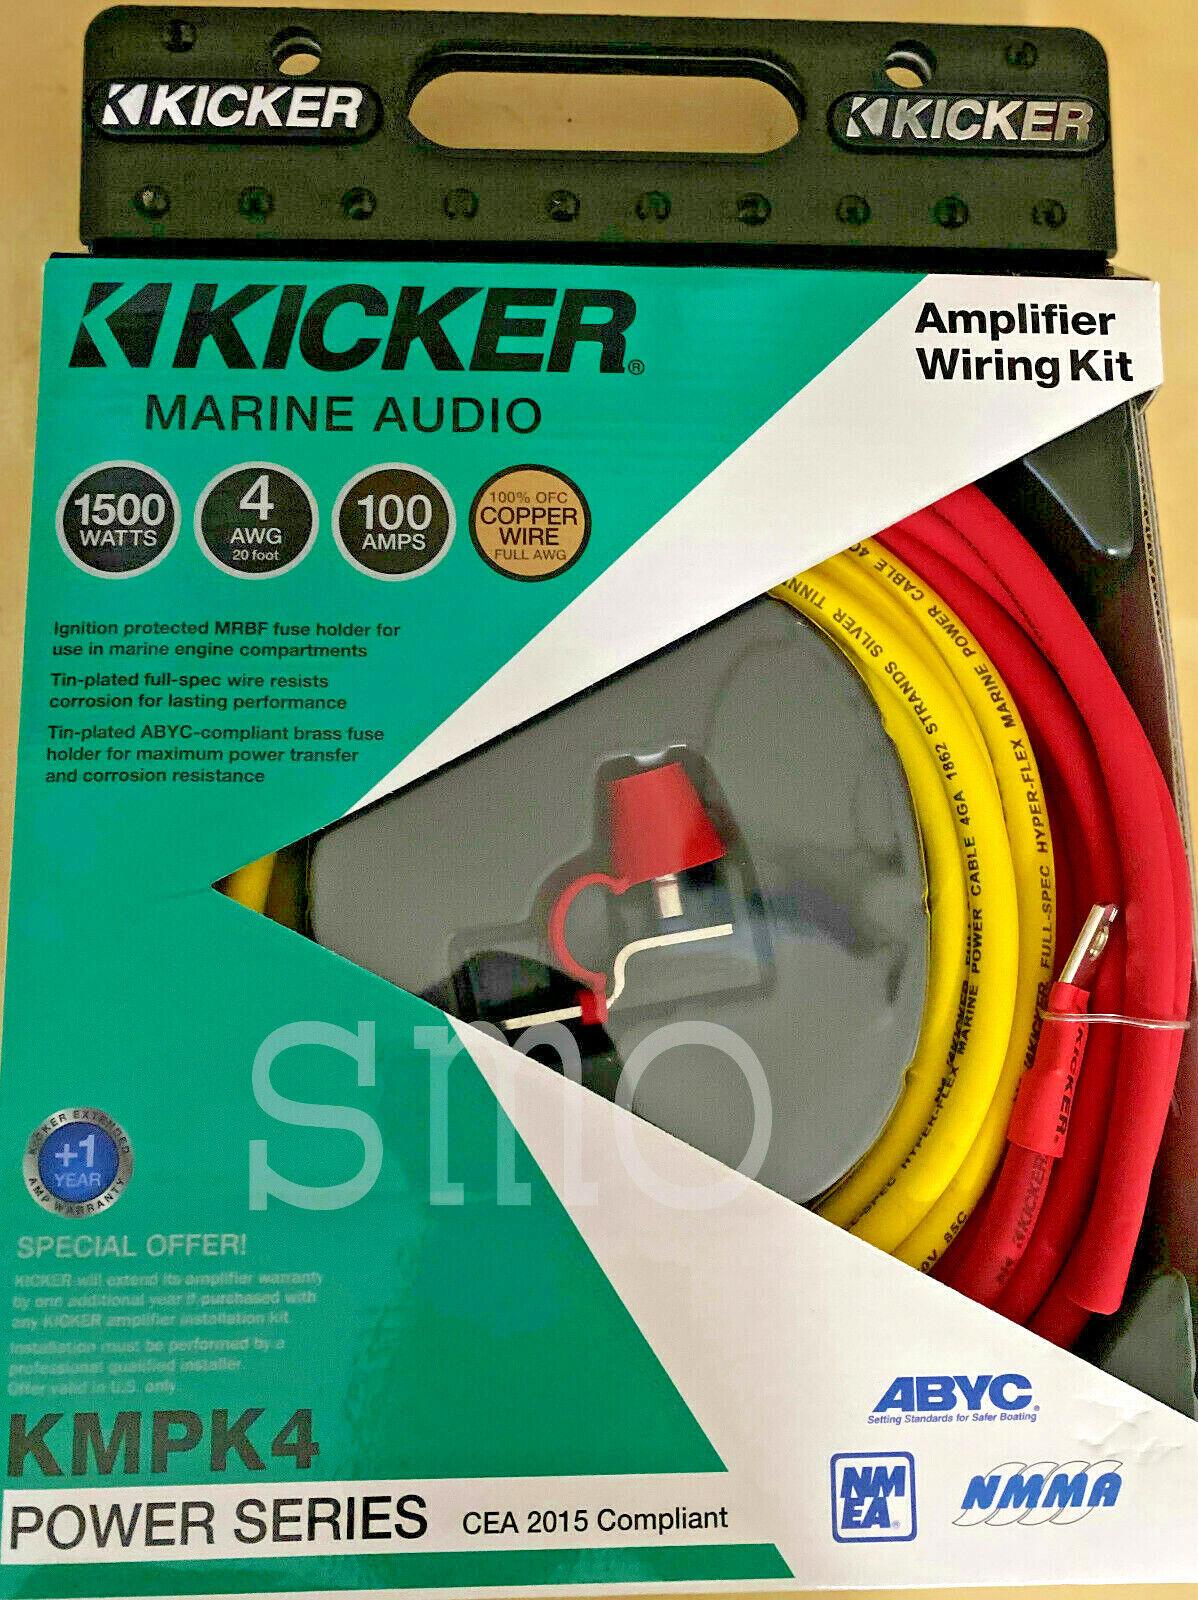 KICKER 47KMPK4 Marine 4 AWG Amplifier Wiring Kit for sale online | eBayeBay